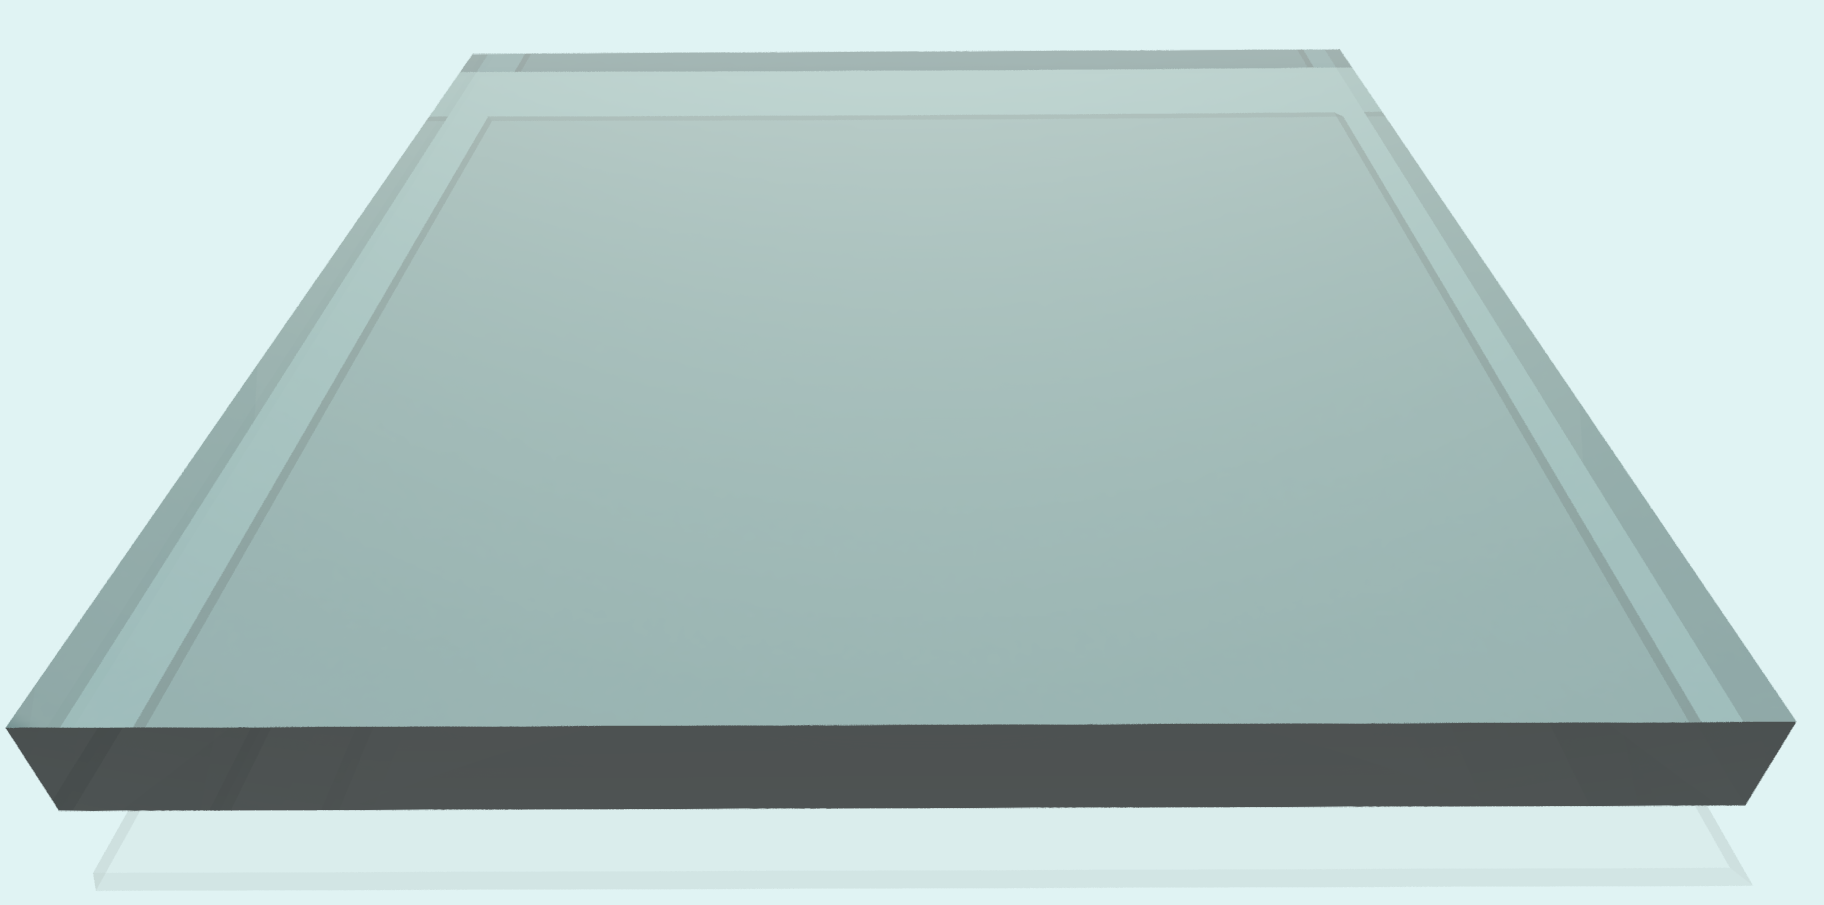 Polycarbonat 15 mm, klar